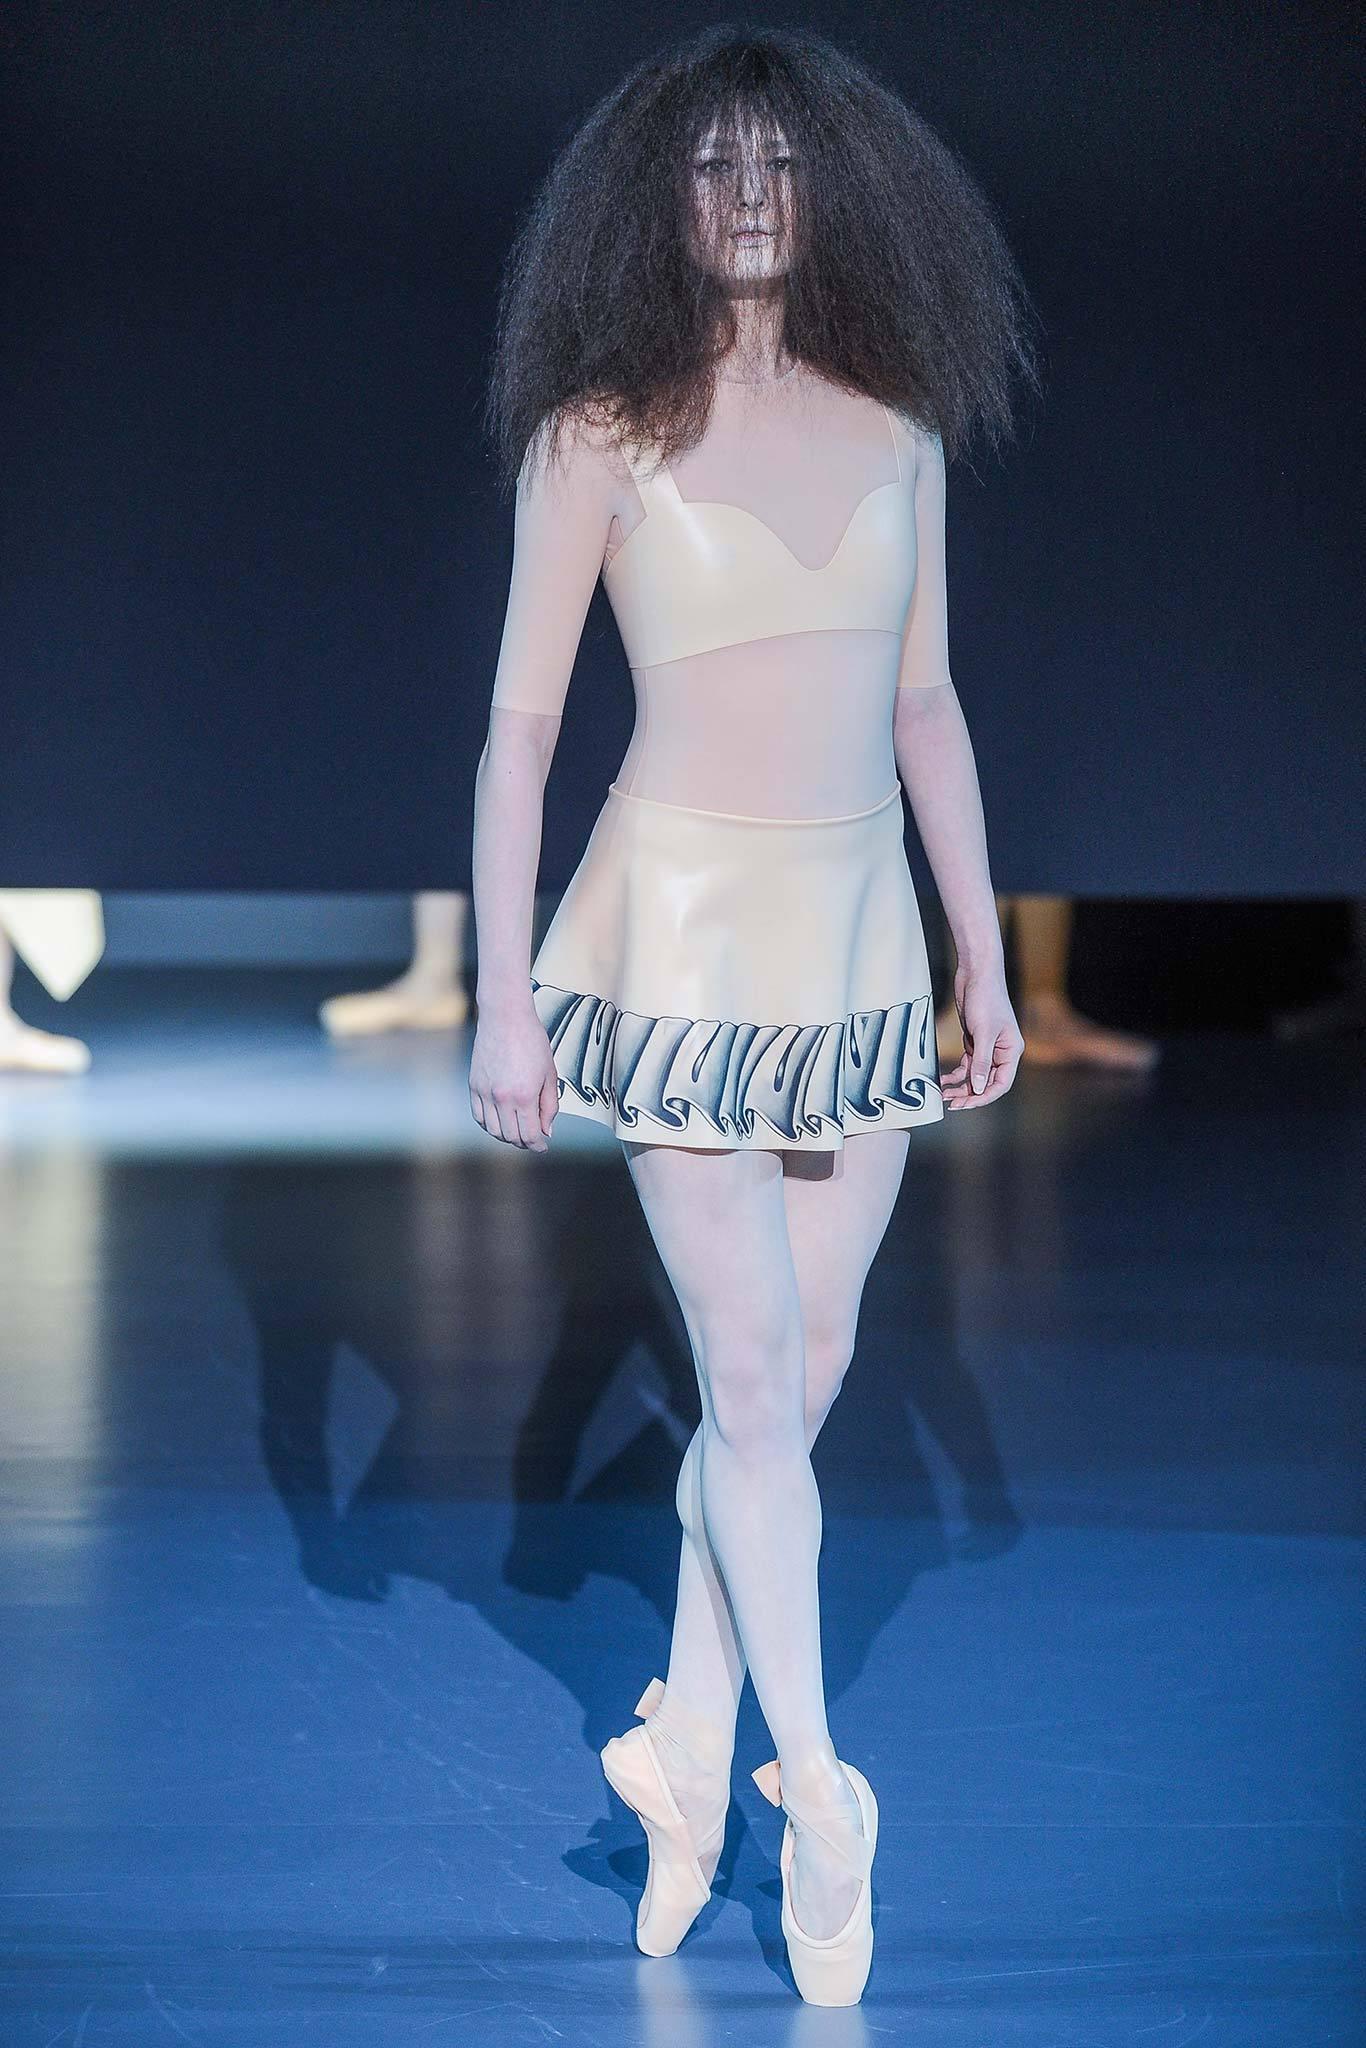 「The Trend」2014 Spring Couture—行動的芭蕾充氣娃娃—Viktor & Rolf – Mr. 布雷蕭